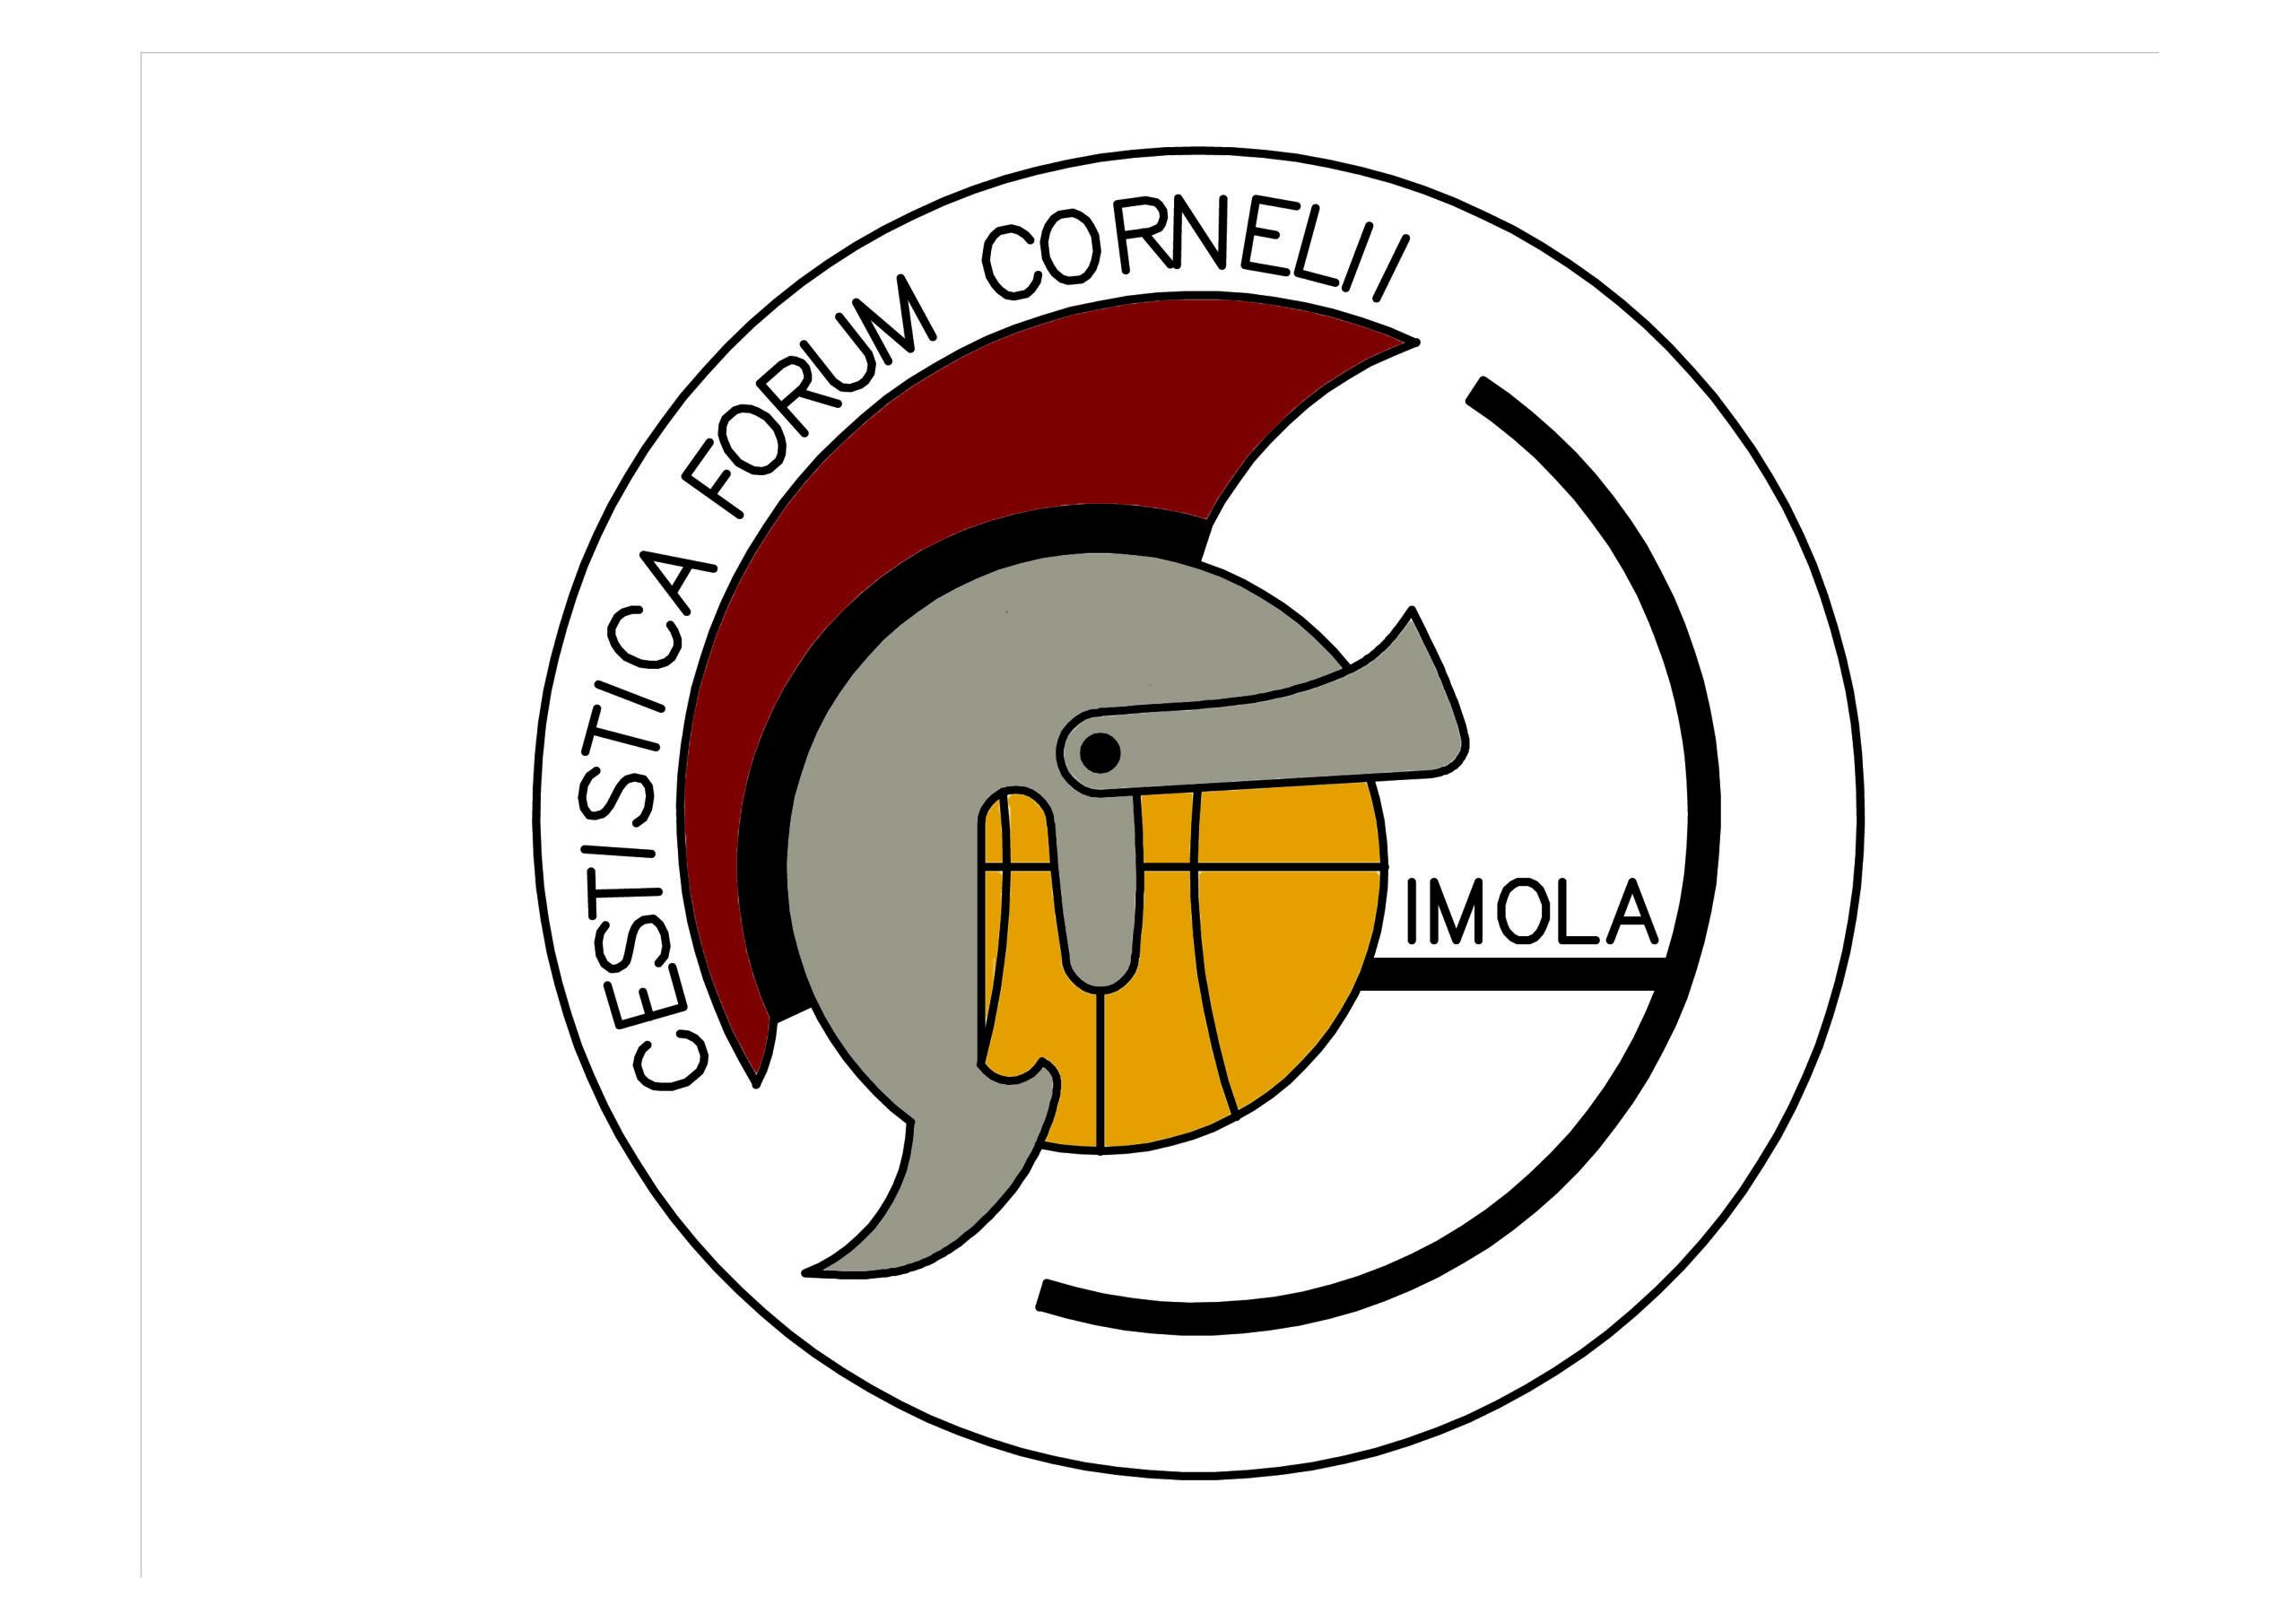 cestistica forum cornelli